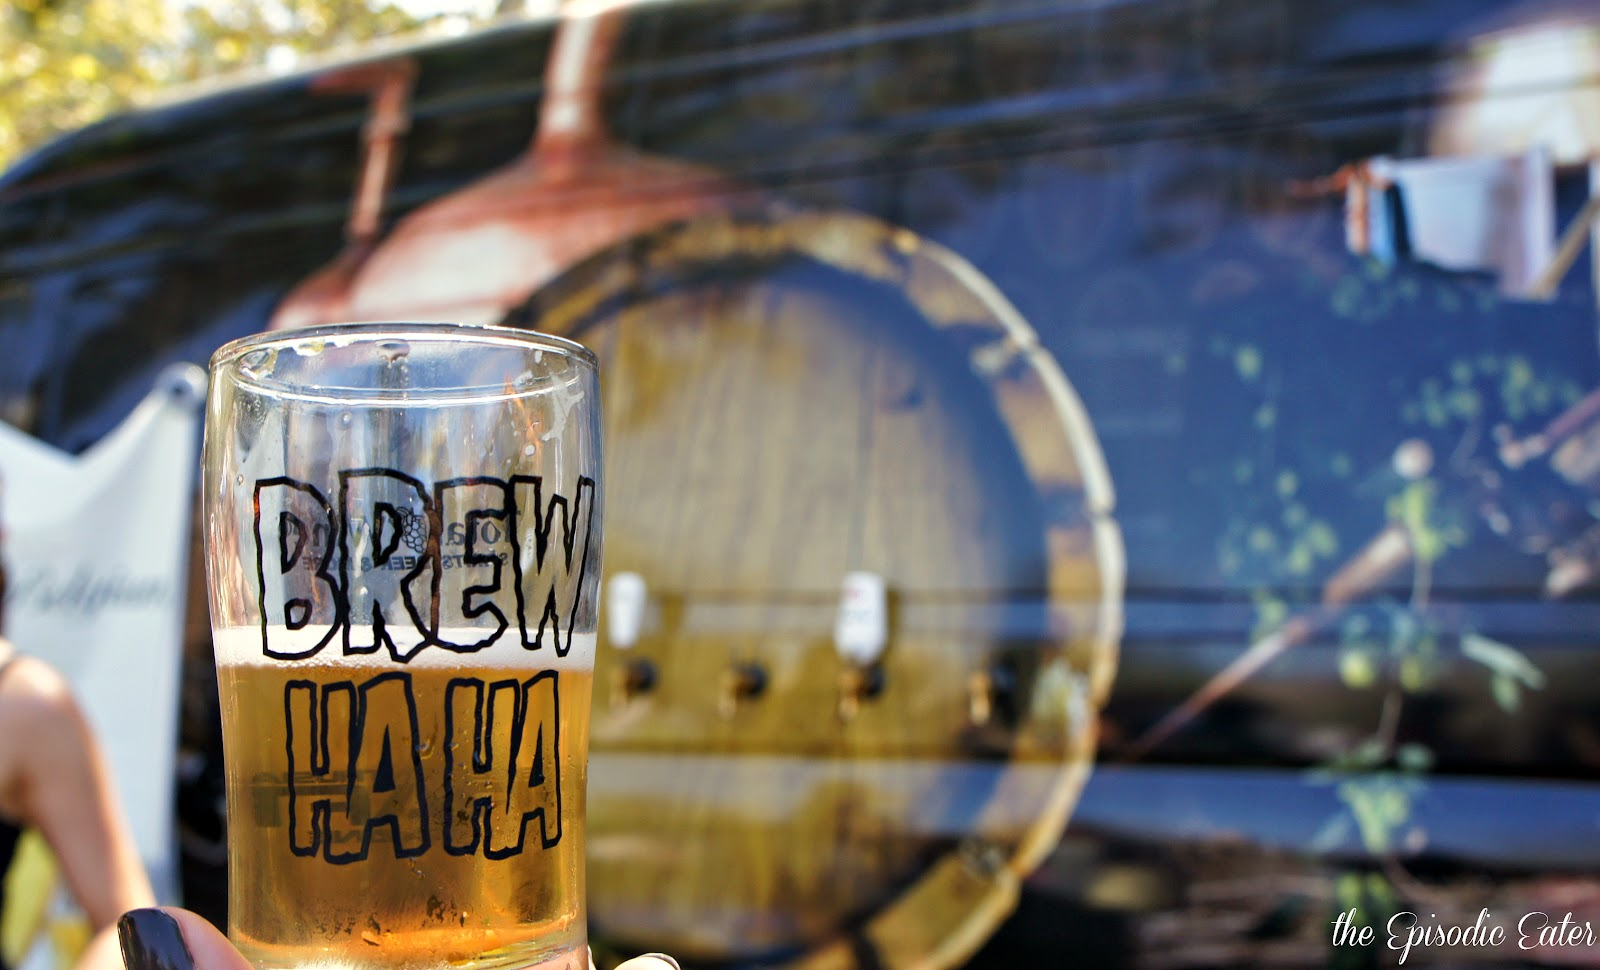 OC Brew Haha (Orange County, CA) on The Episodic Eater